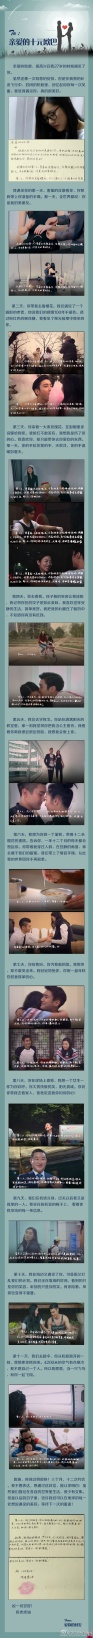 150717 siwon liu wen 江苏卫视我们相爱吧5